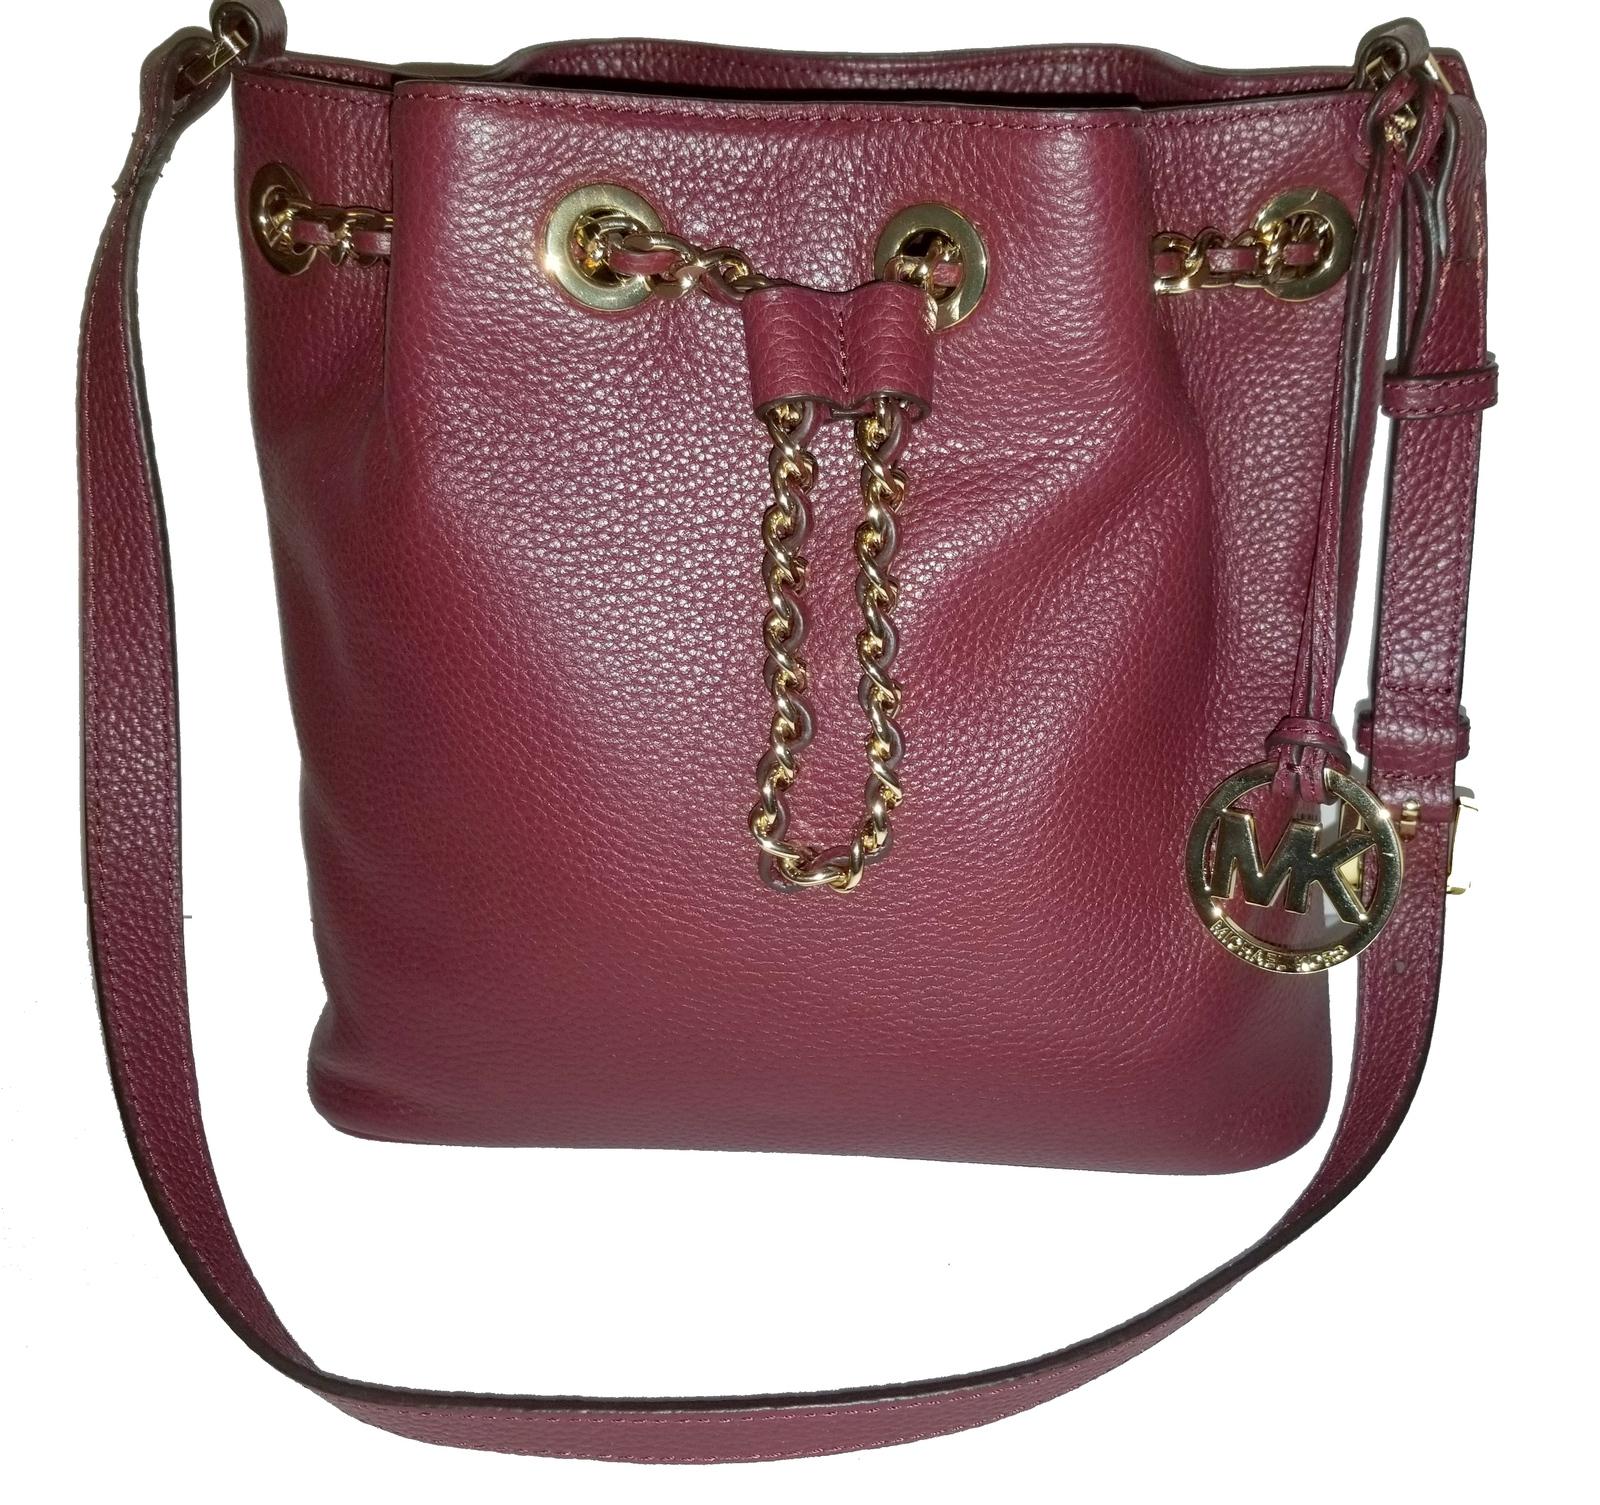 Michael Kors Bucket Shoulder Frankie Oxblood Burgundy Leather Cross Body Bag